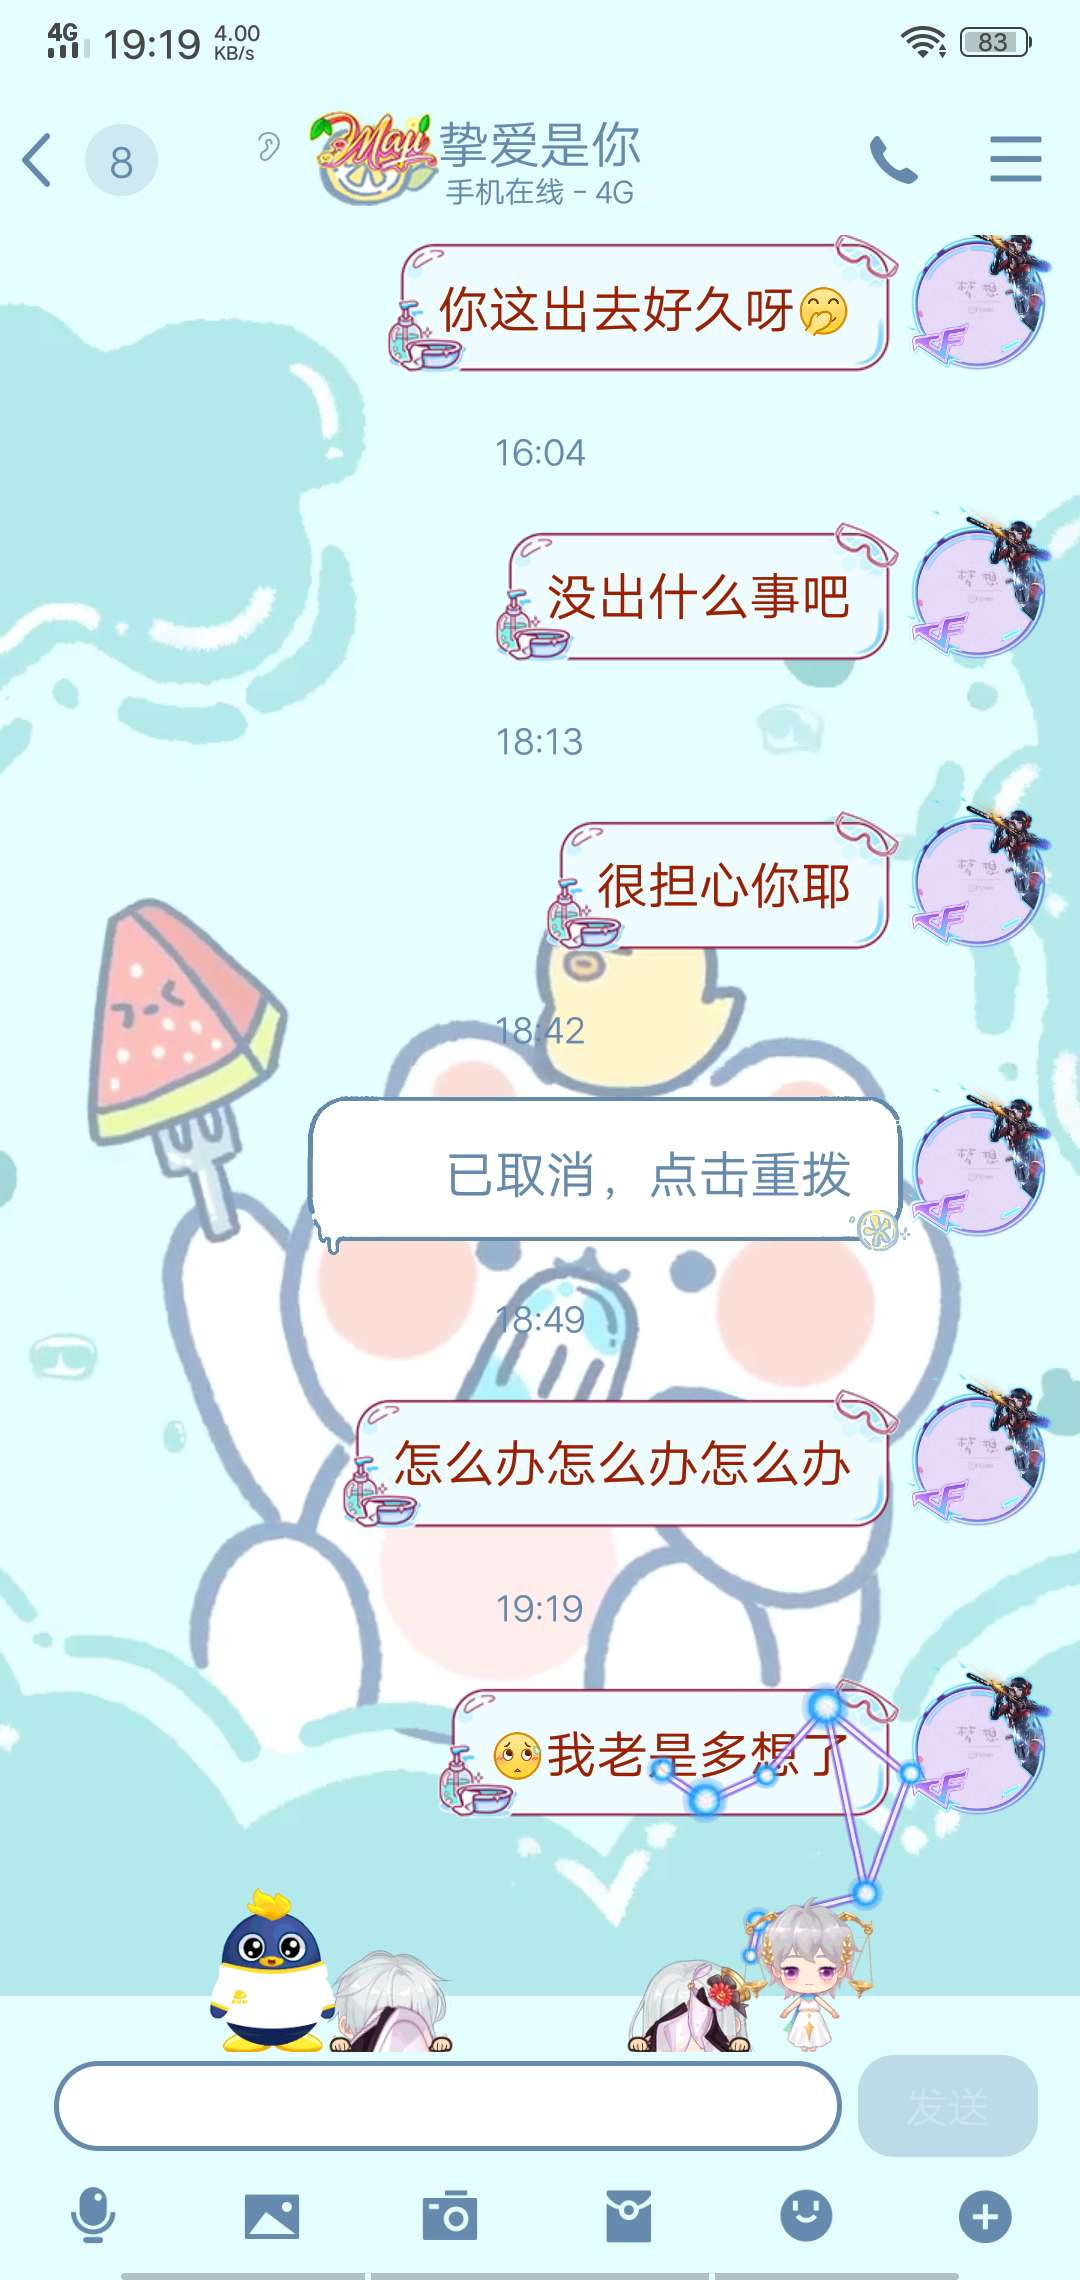 QQ超会免费领七夕装扮插图7